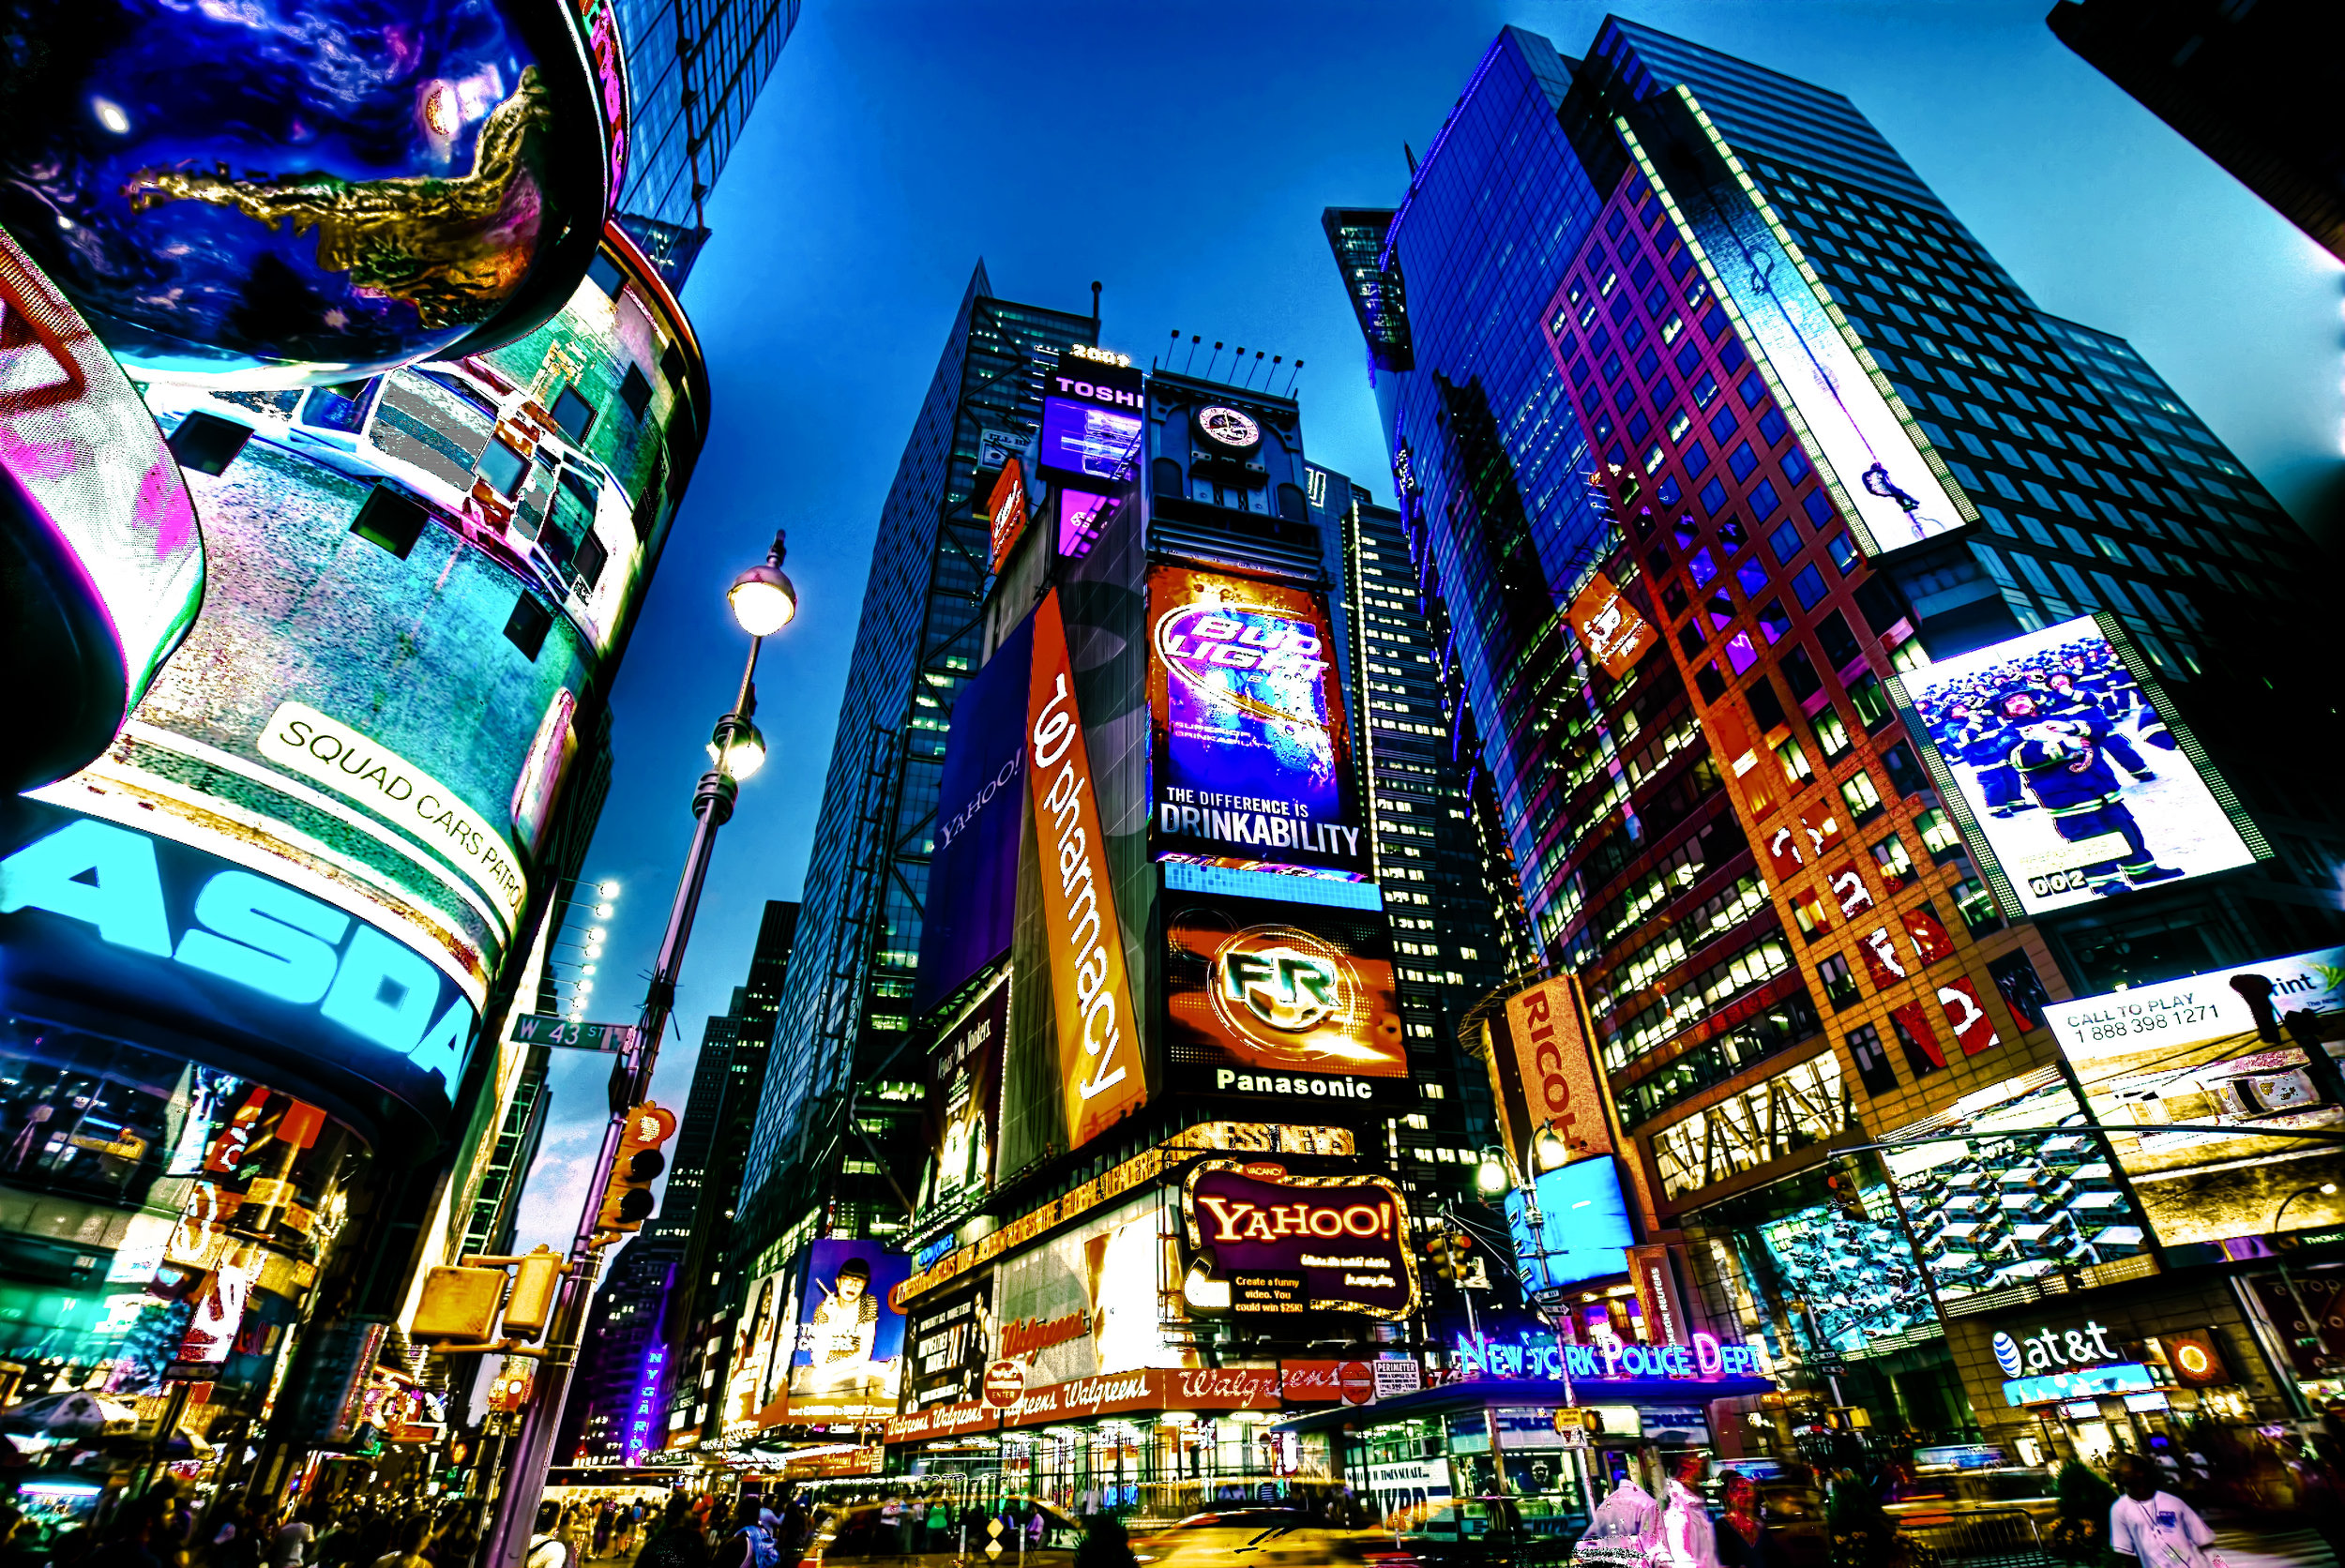 Times_Square,_New_York_City_(HDR).jpg